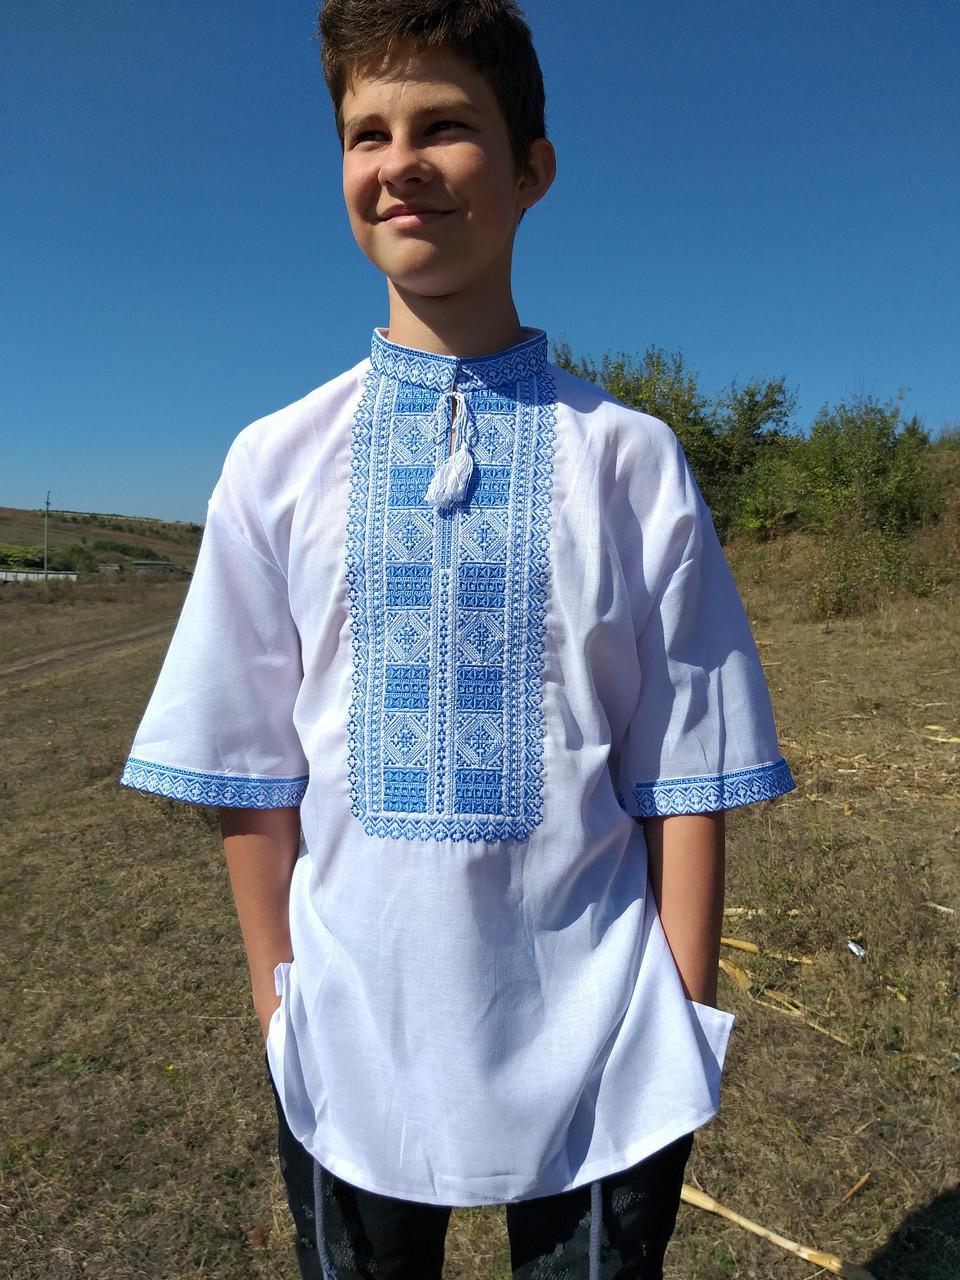 Мужская вышиванка на домотканке, короткий рукав, 56 р-р, 480/550 (цена за 1 шт. + 70 гр.)